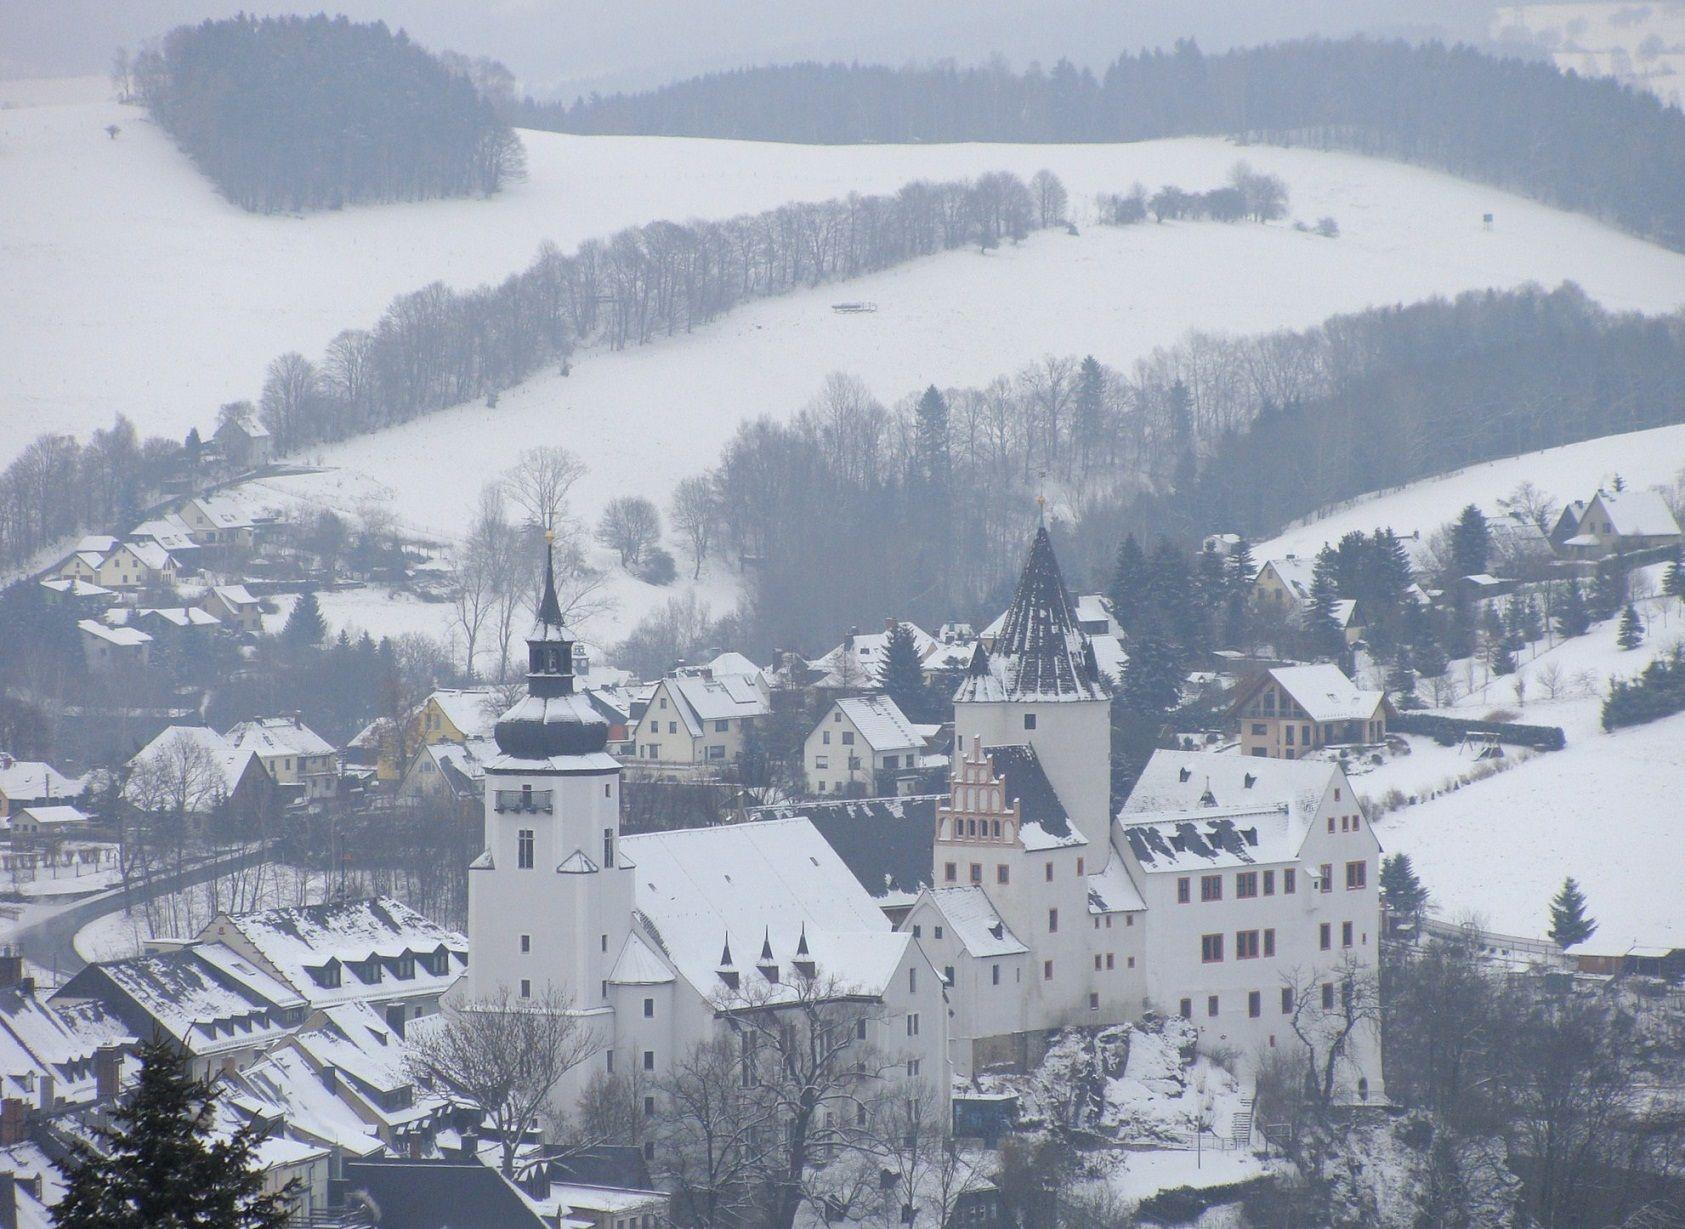 Gotha mobili ~ The church and castle of schwarzenberg germany almanach de